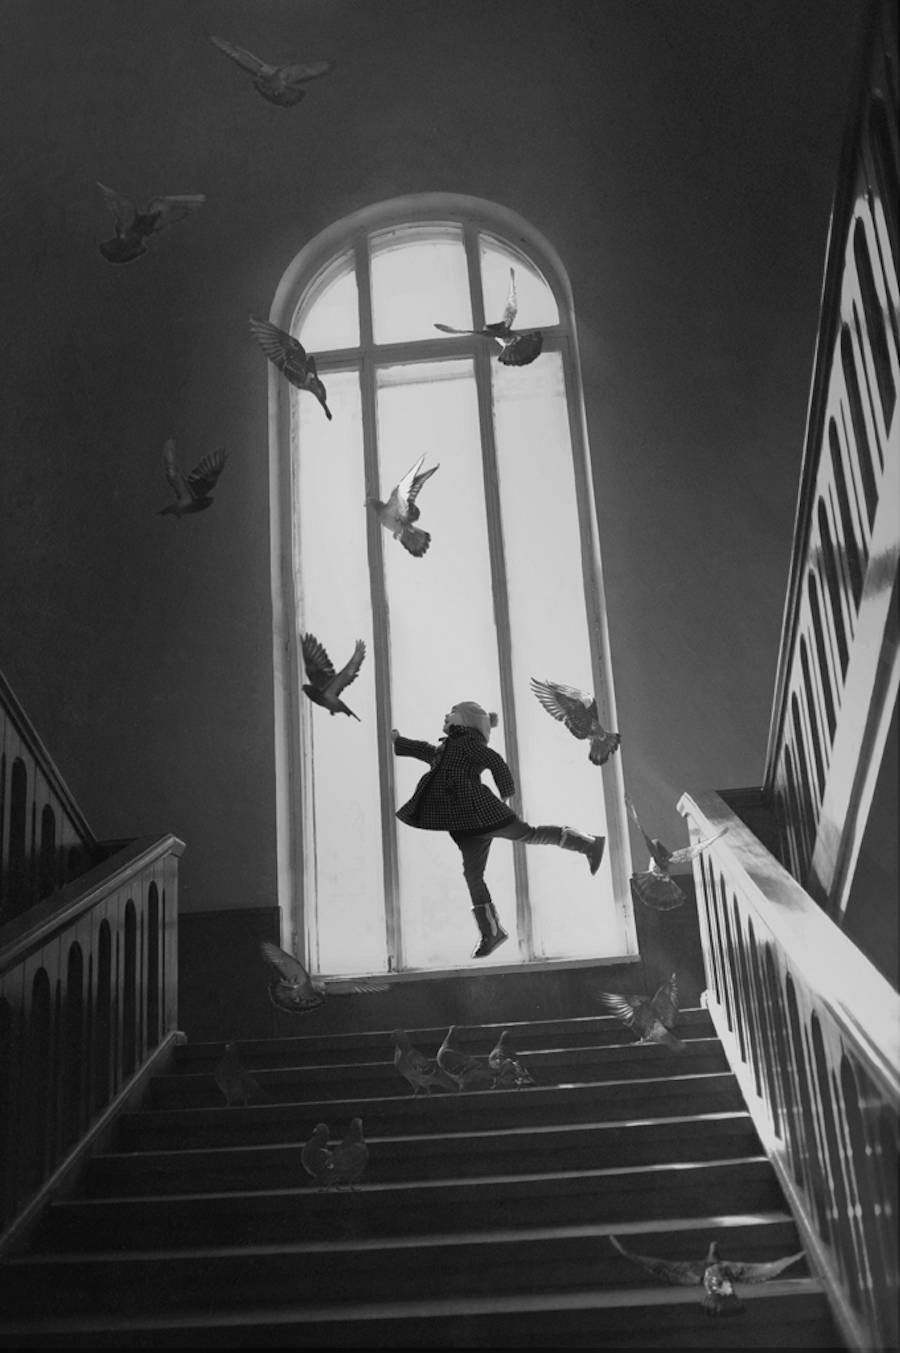 Music of flight by oksana but ukraine black and white child photography contest 2015 winners